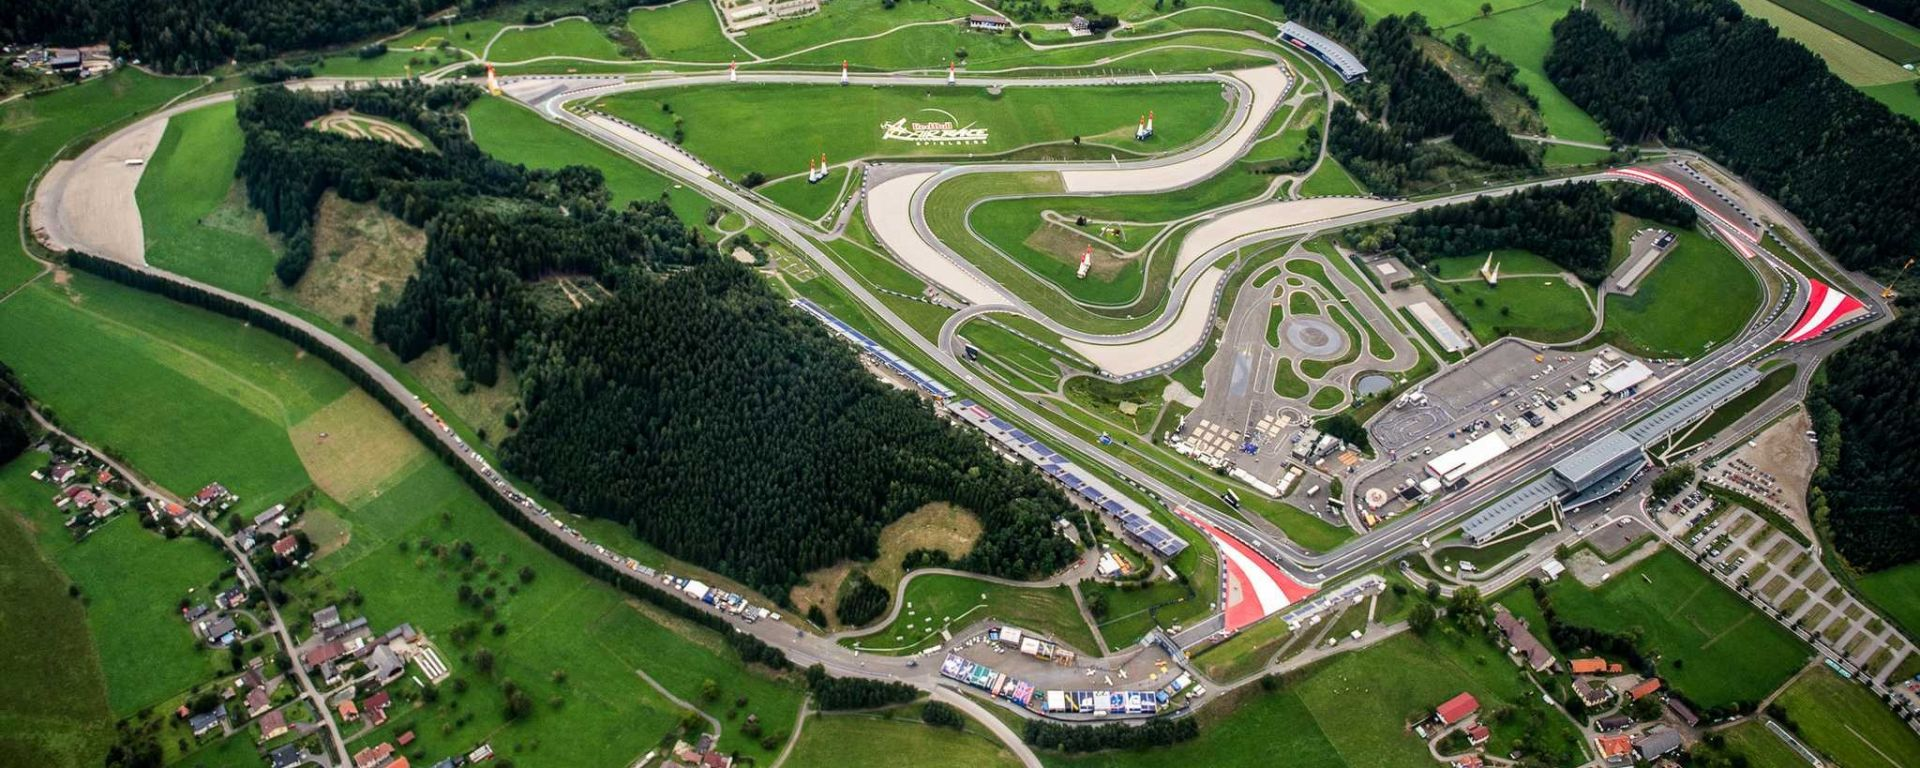 MotoGP Red Bull Ring Austria: Prove libere, qualifiche, risultati gara